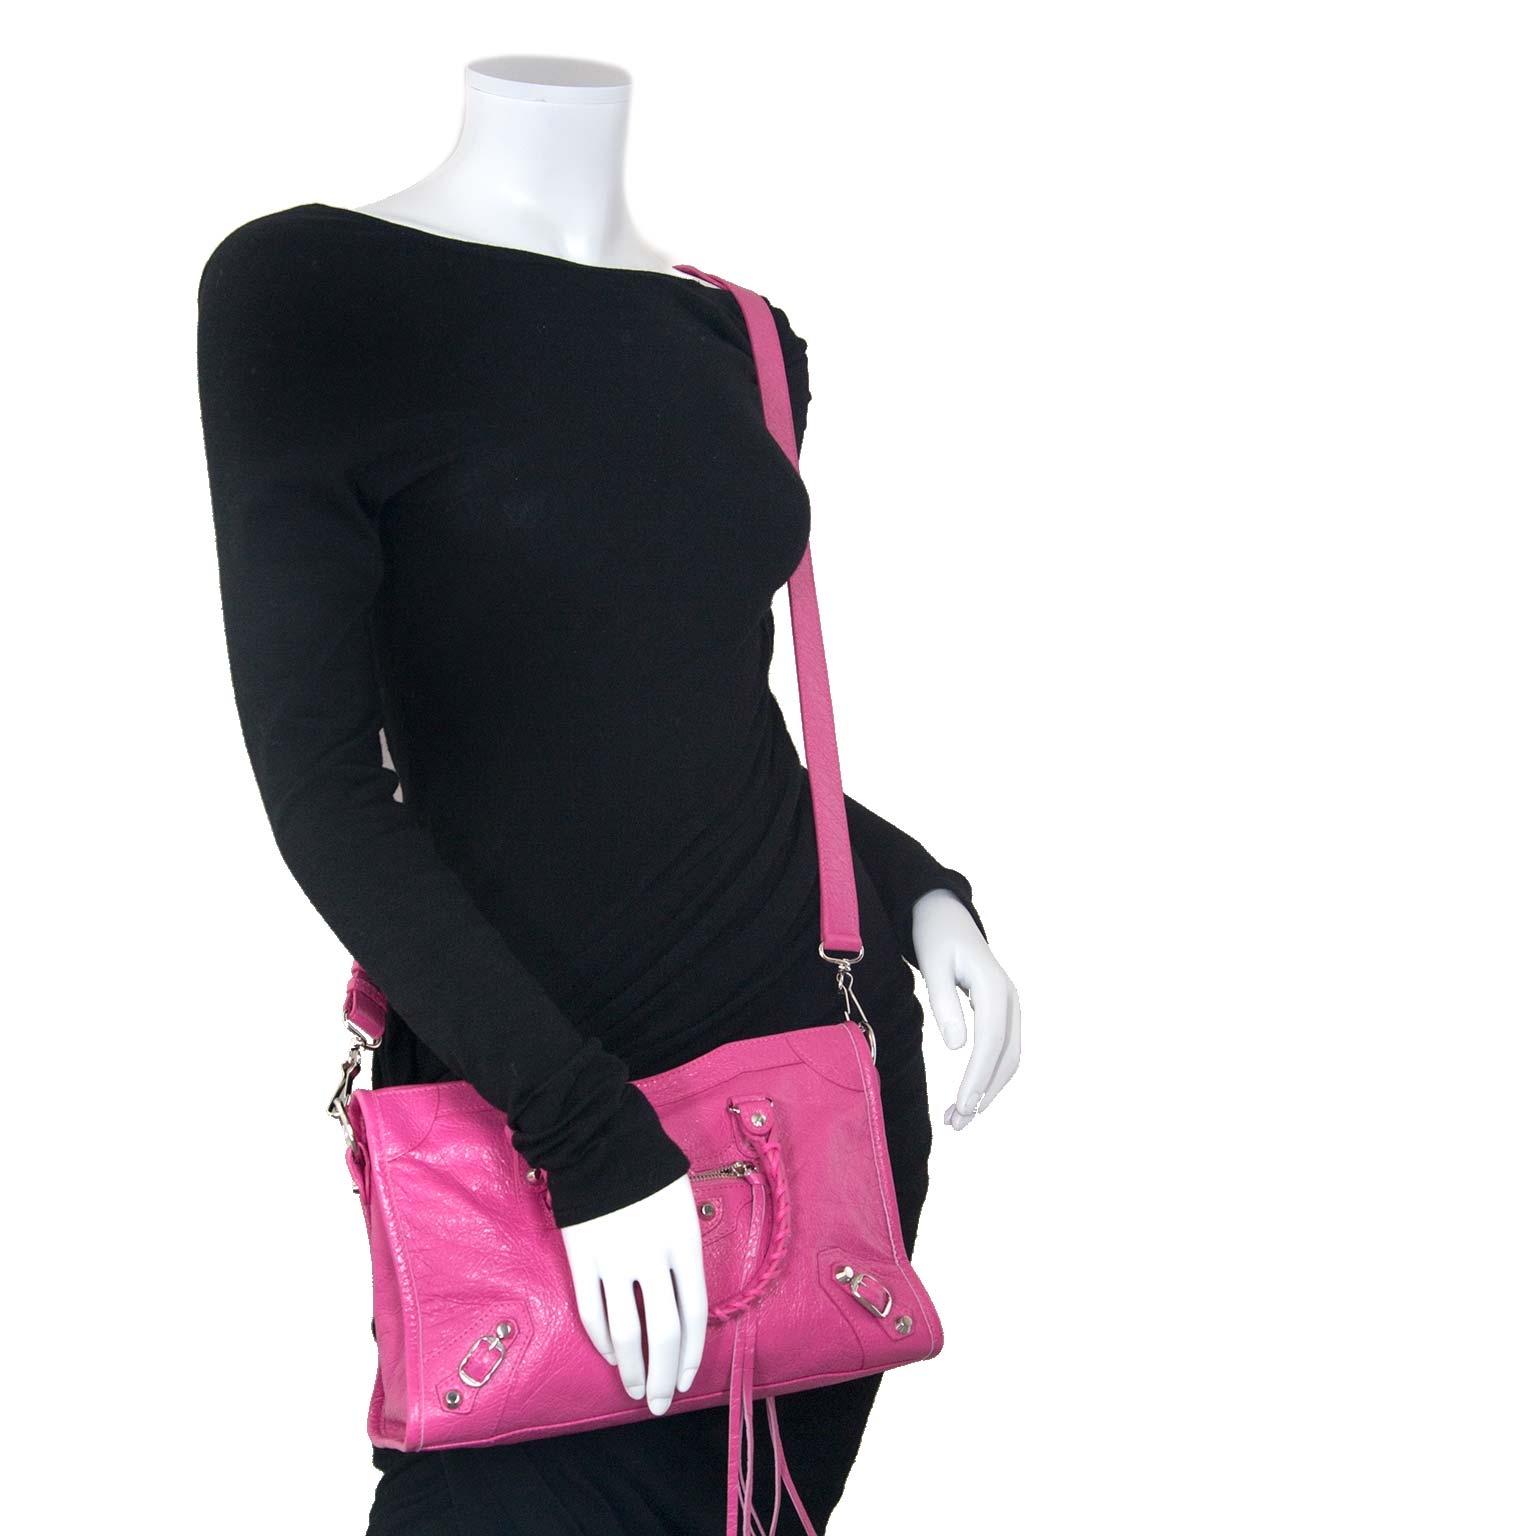 Balenciaga City S Rose Flamingo Agneau Leather te koop aan de beste prijs bij Labellov